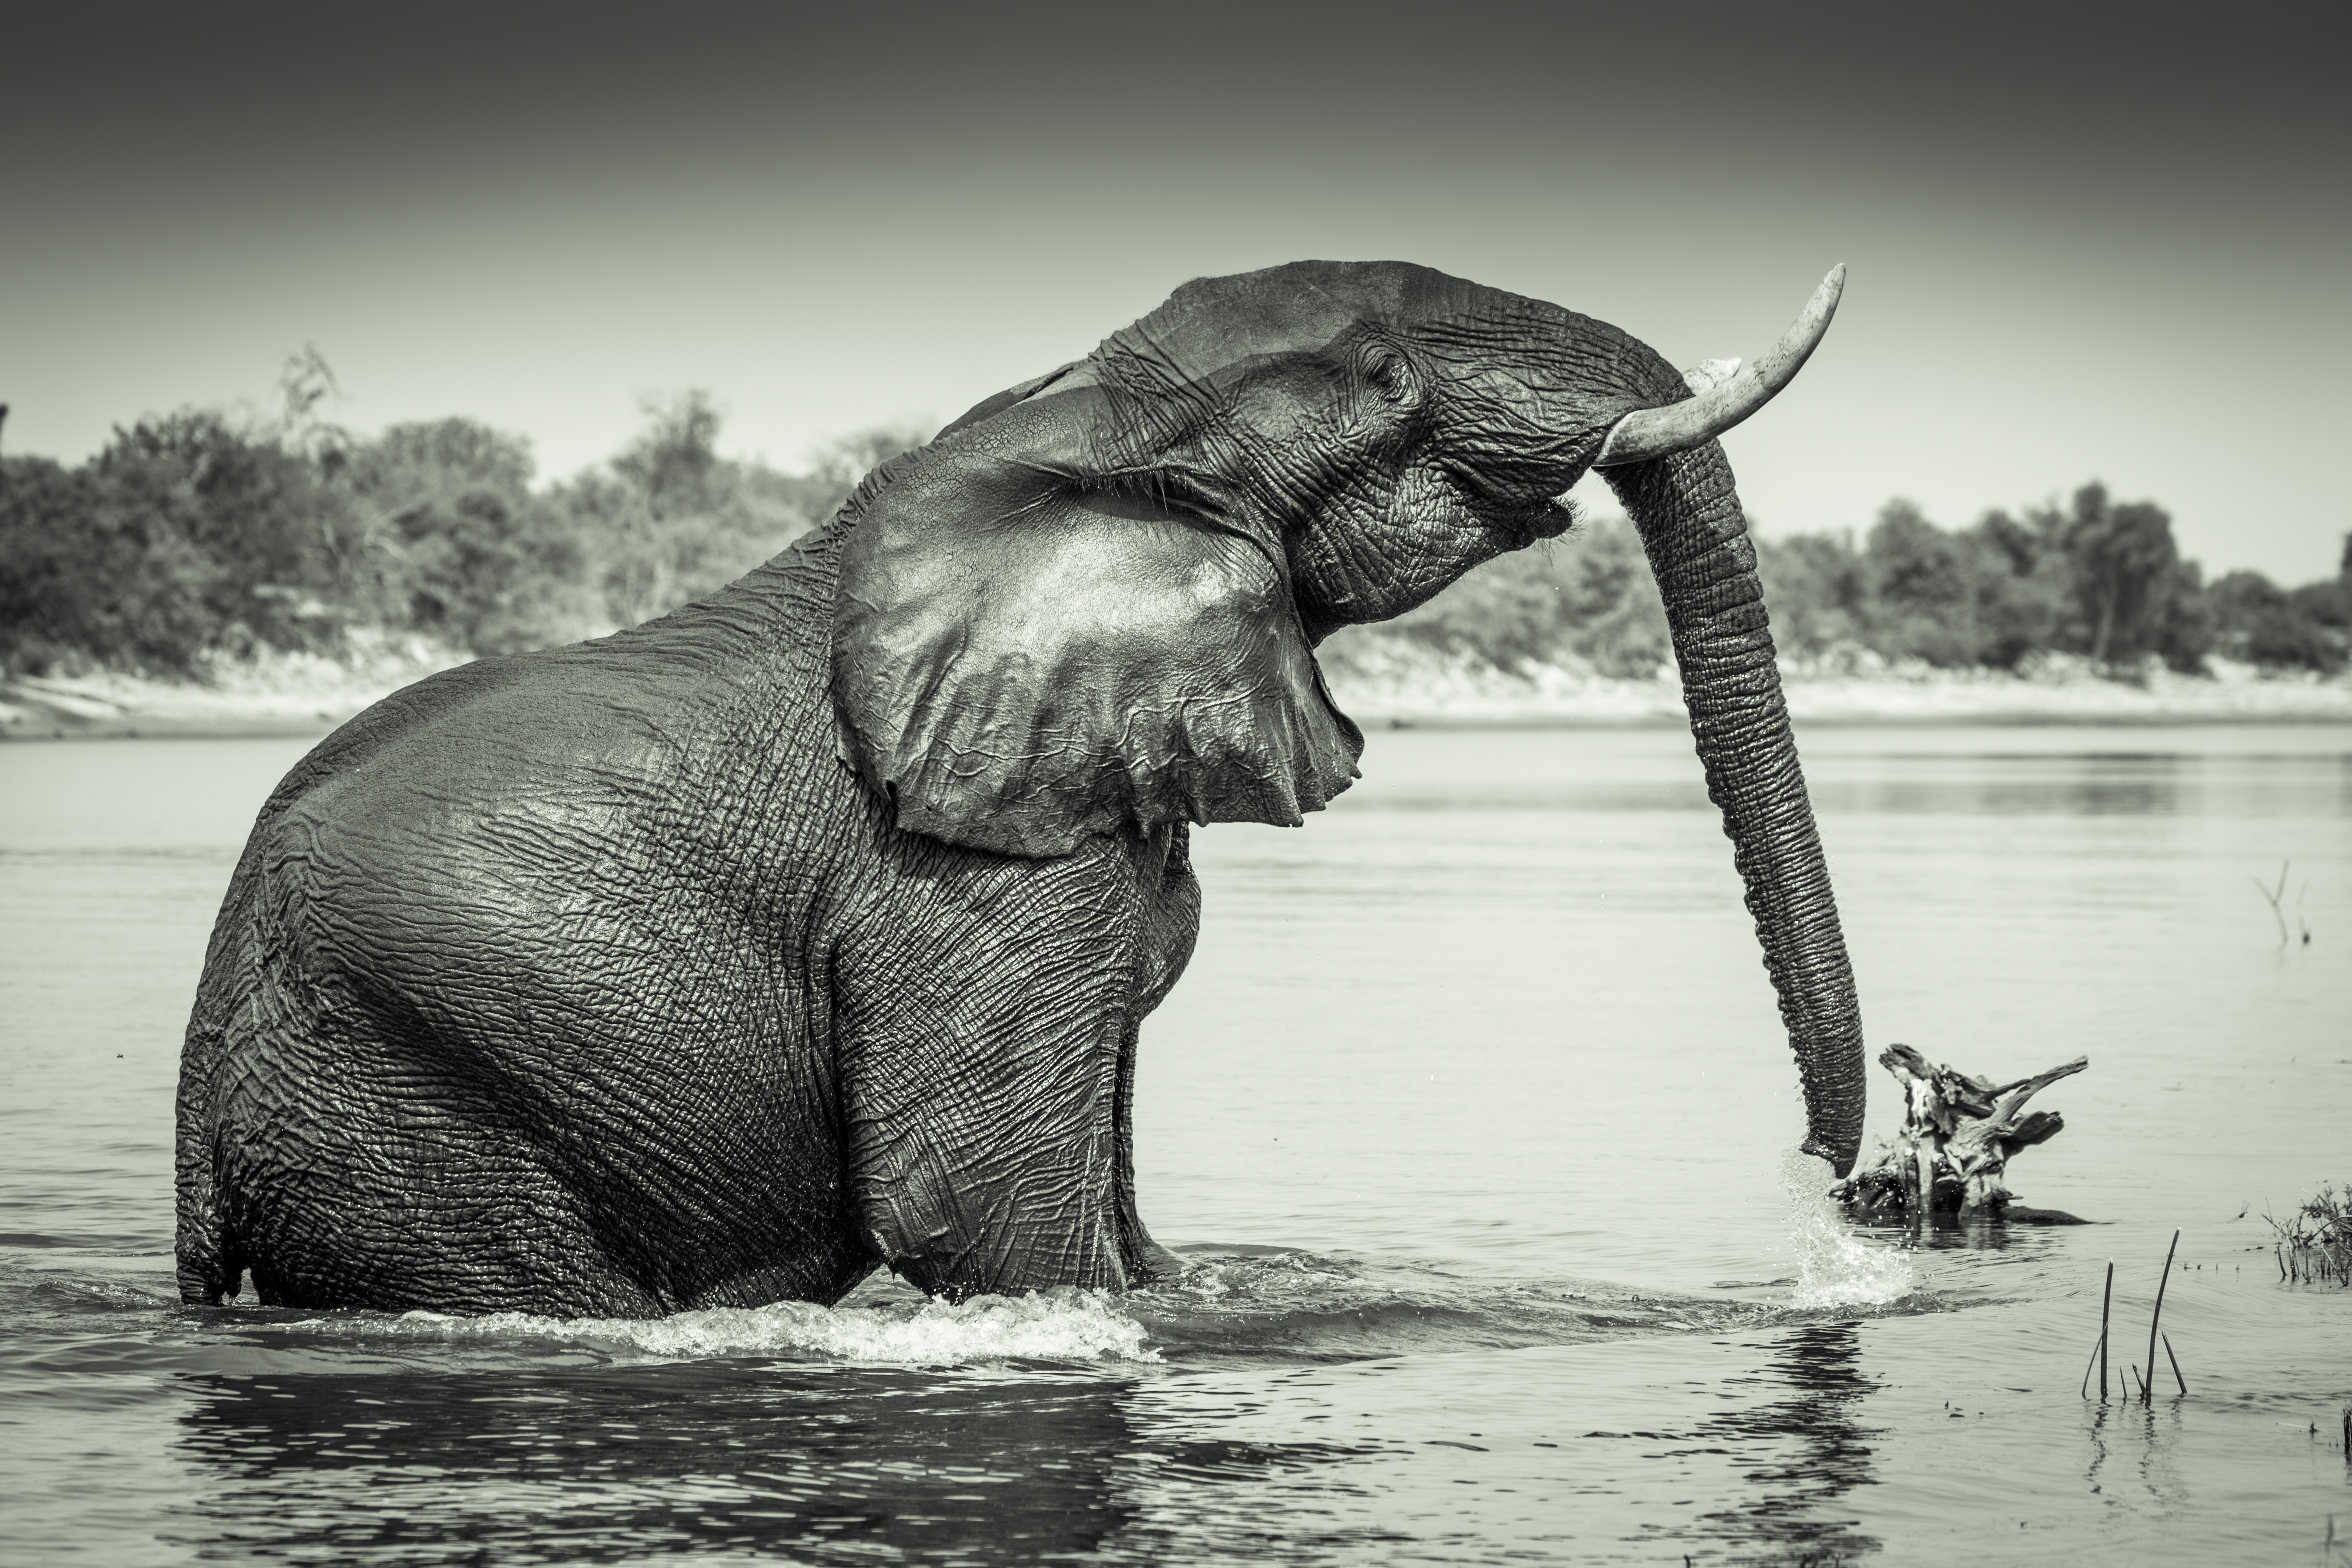 Elephant, Chobe River, Botswana